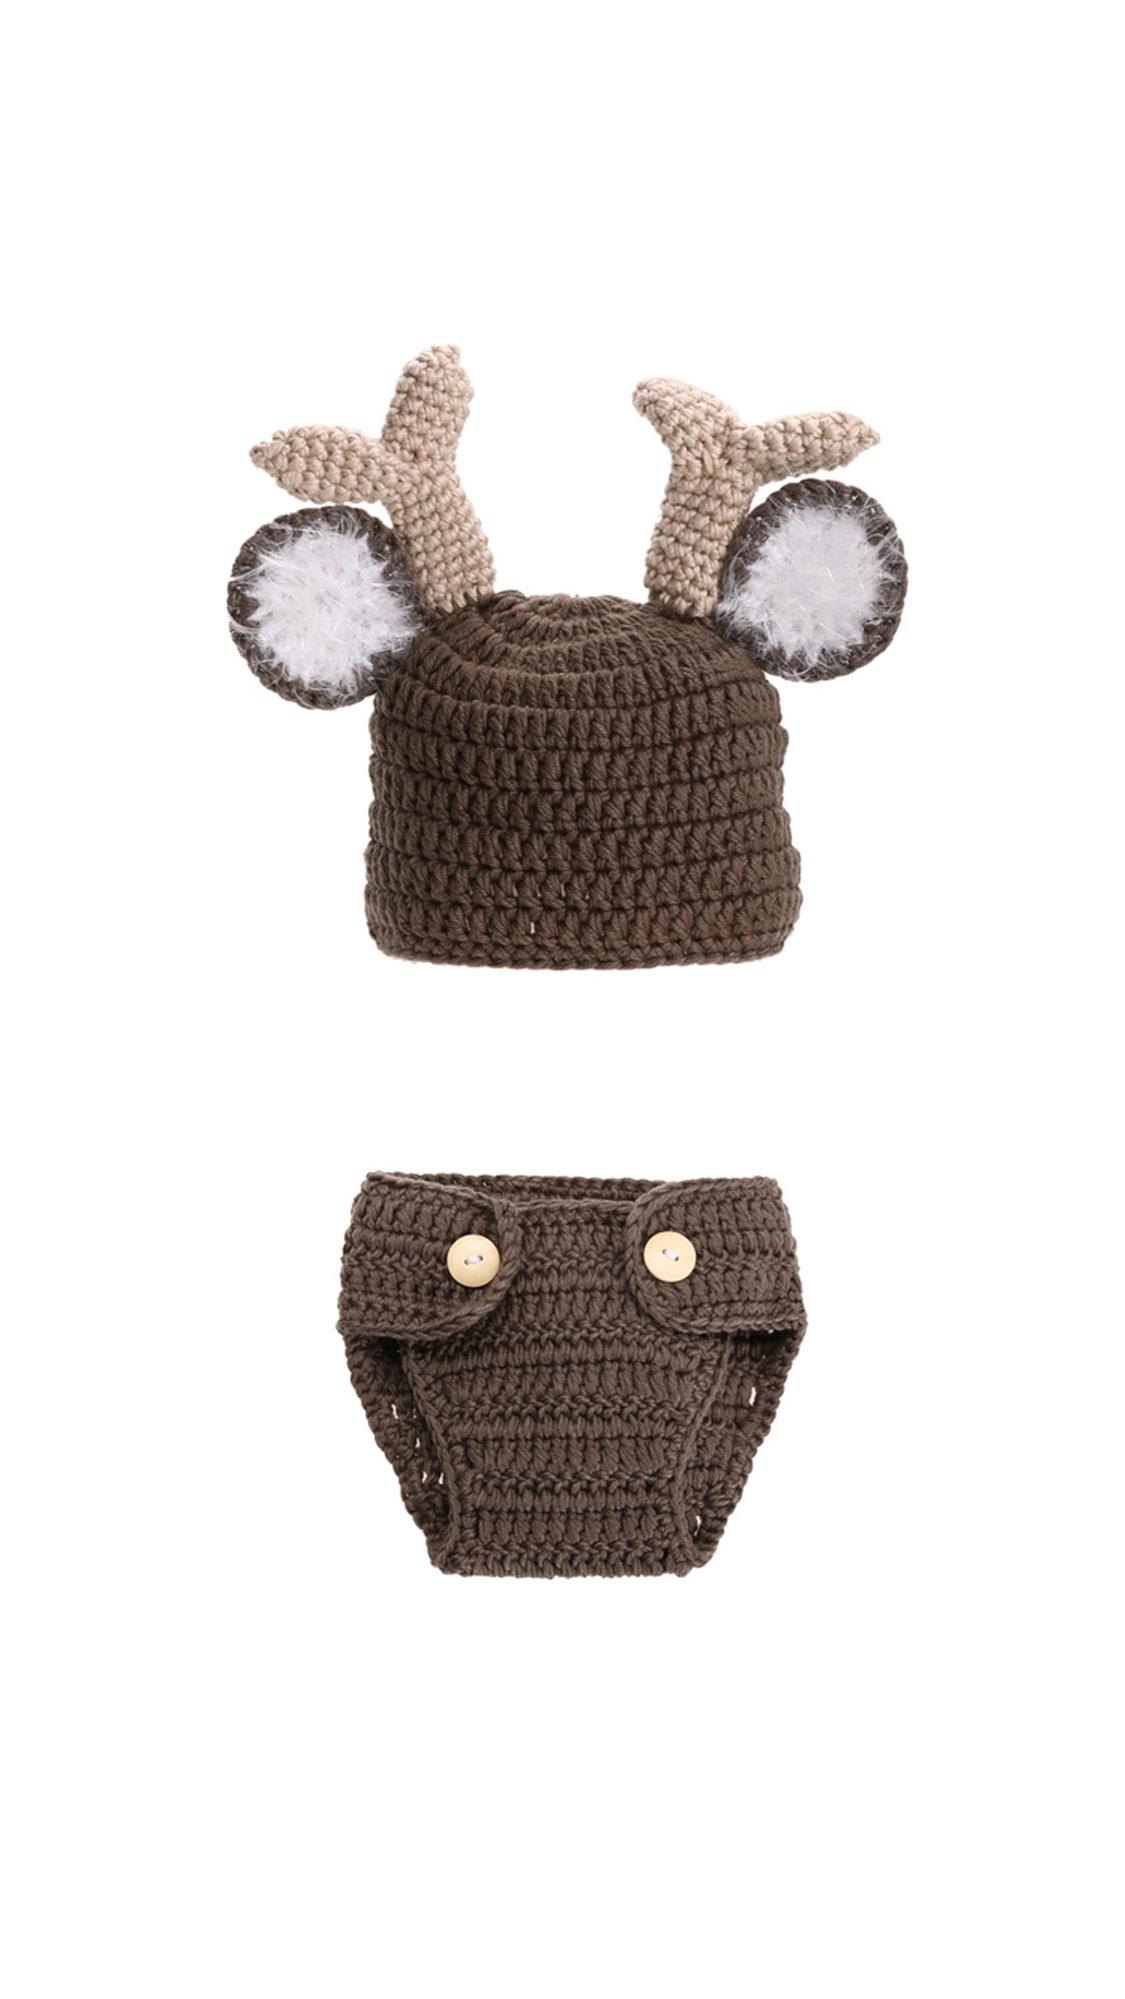 Newborn Baby Girls Boys Crochet Knit Costume Photography Props